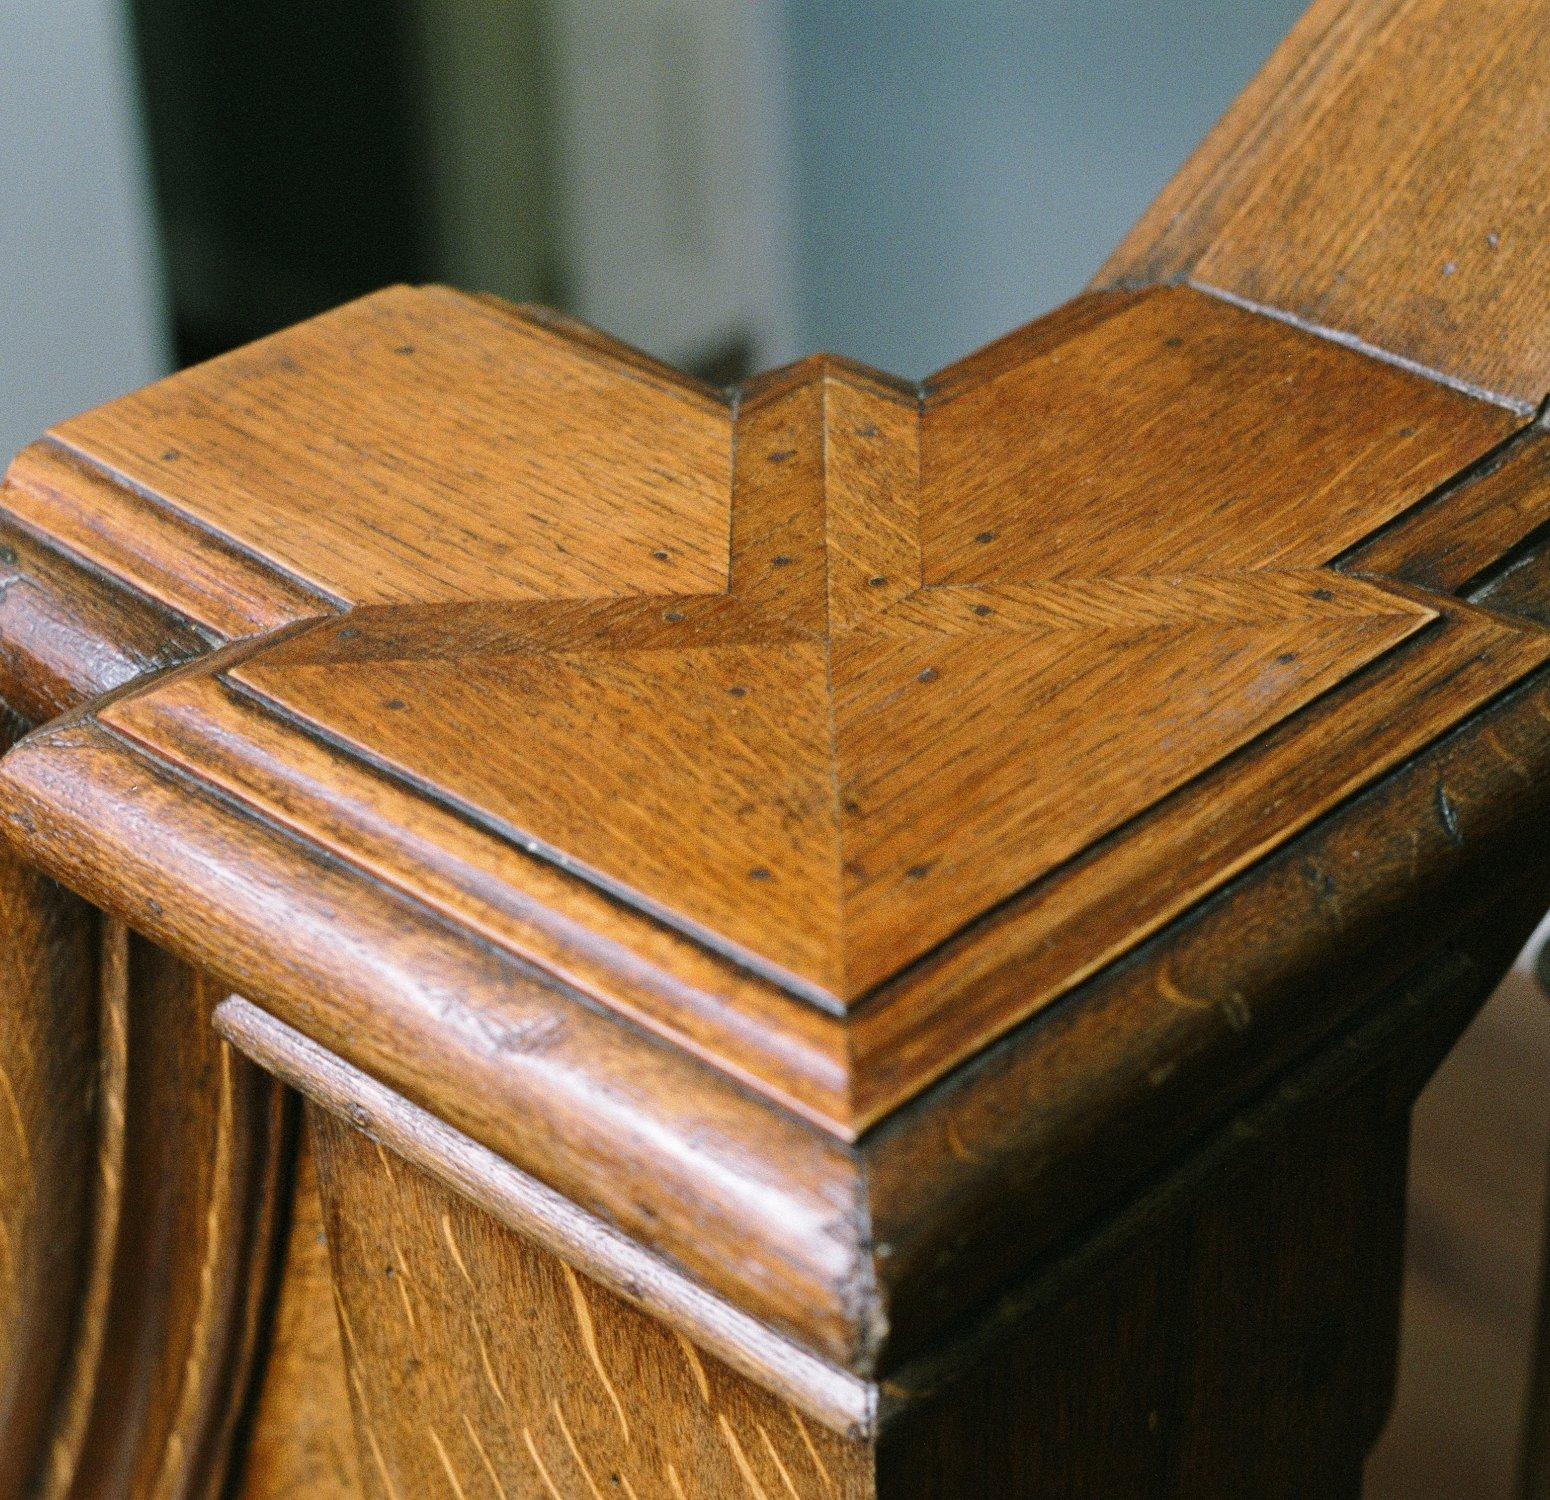 Detail of the oak newel cap